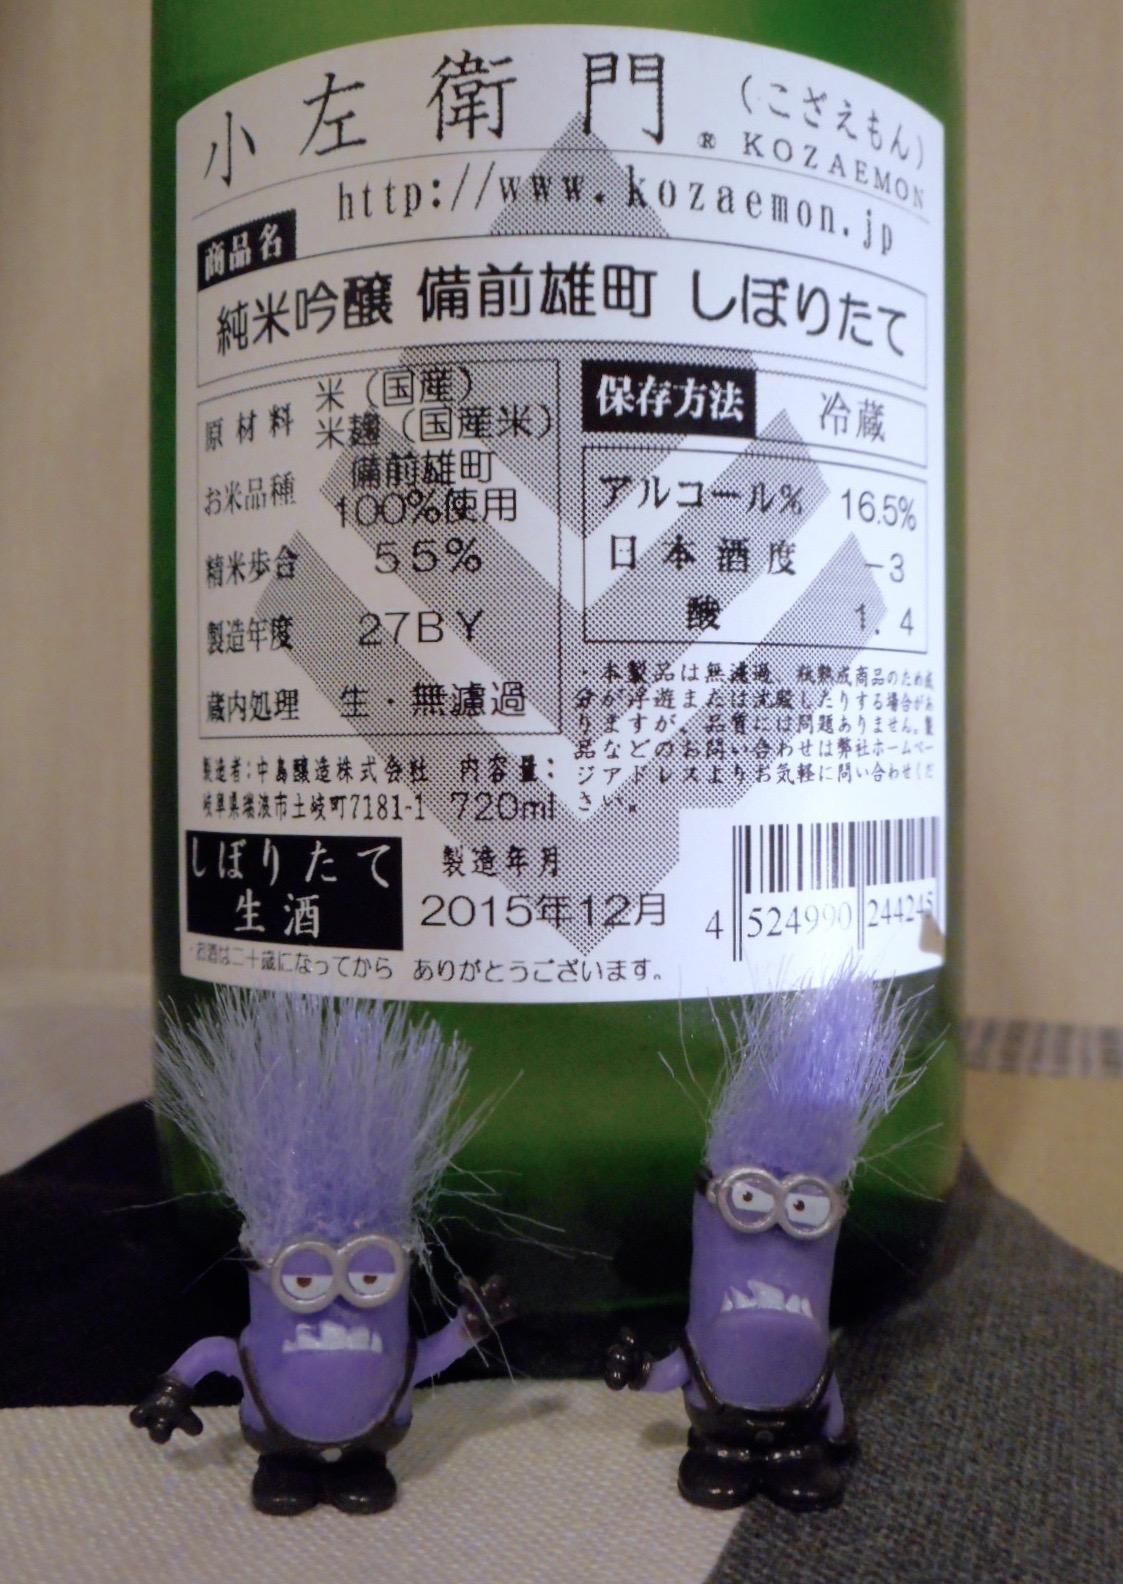 kozaemon_omachi_nama2.jpg